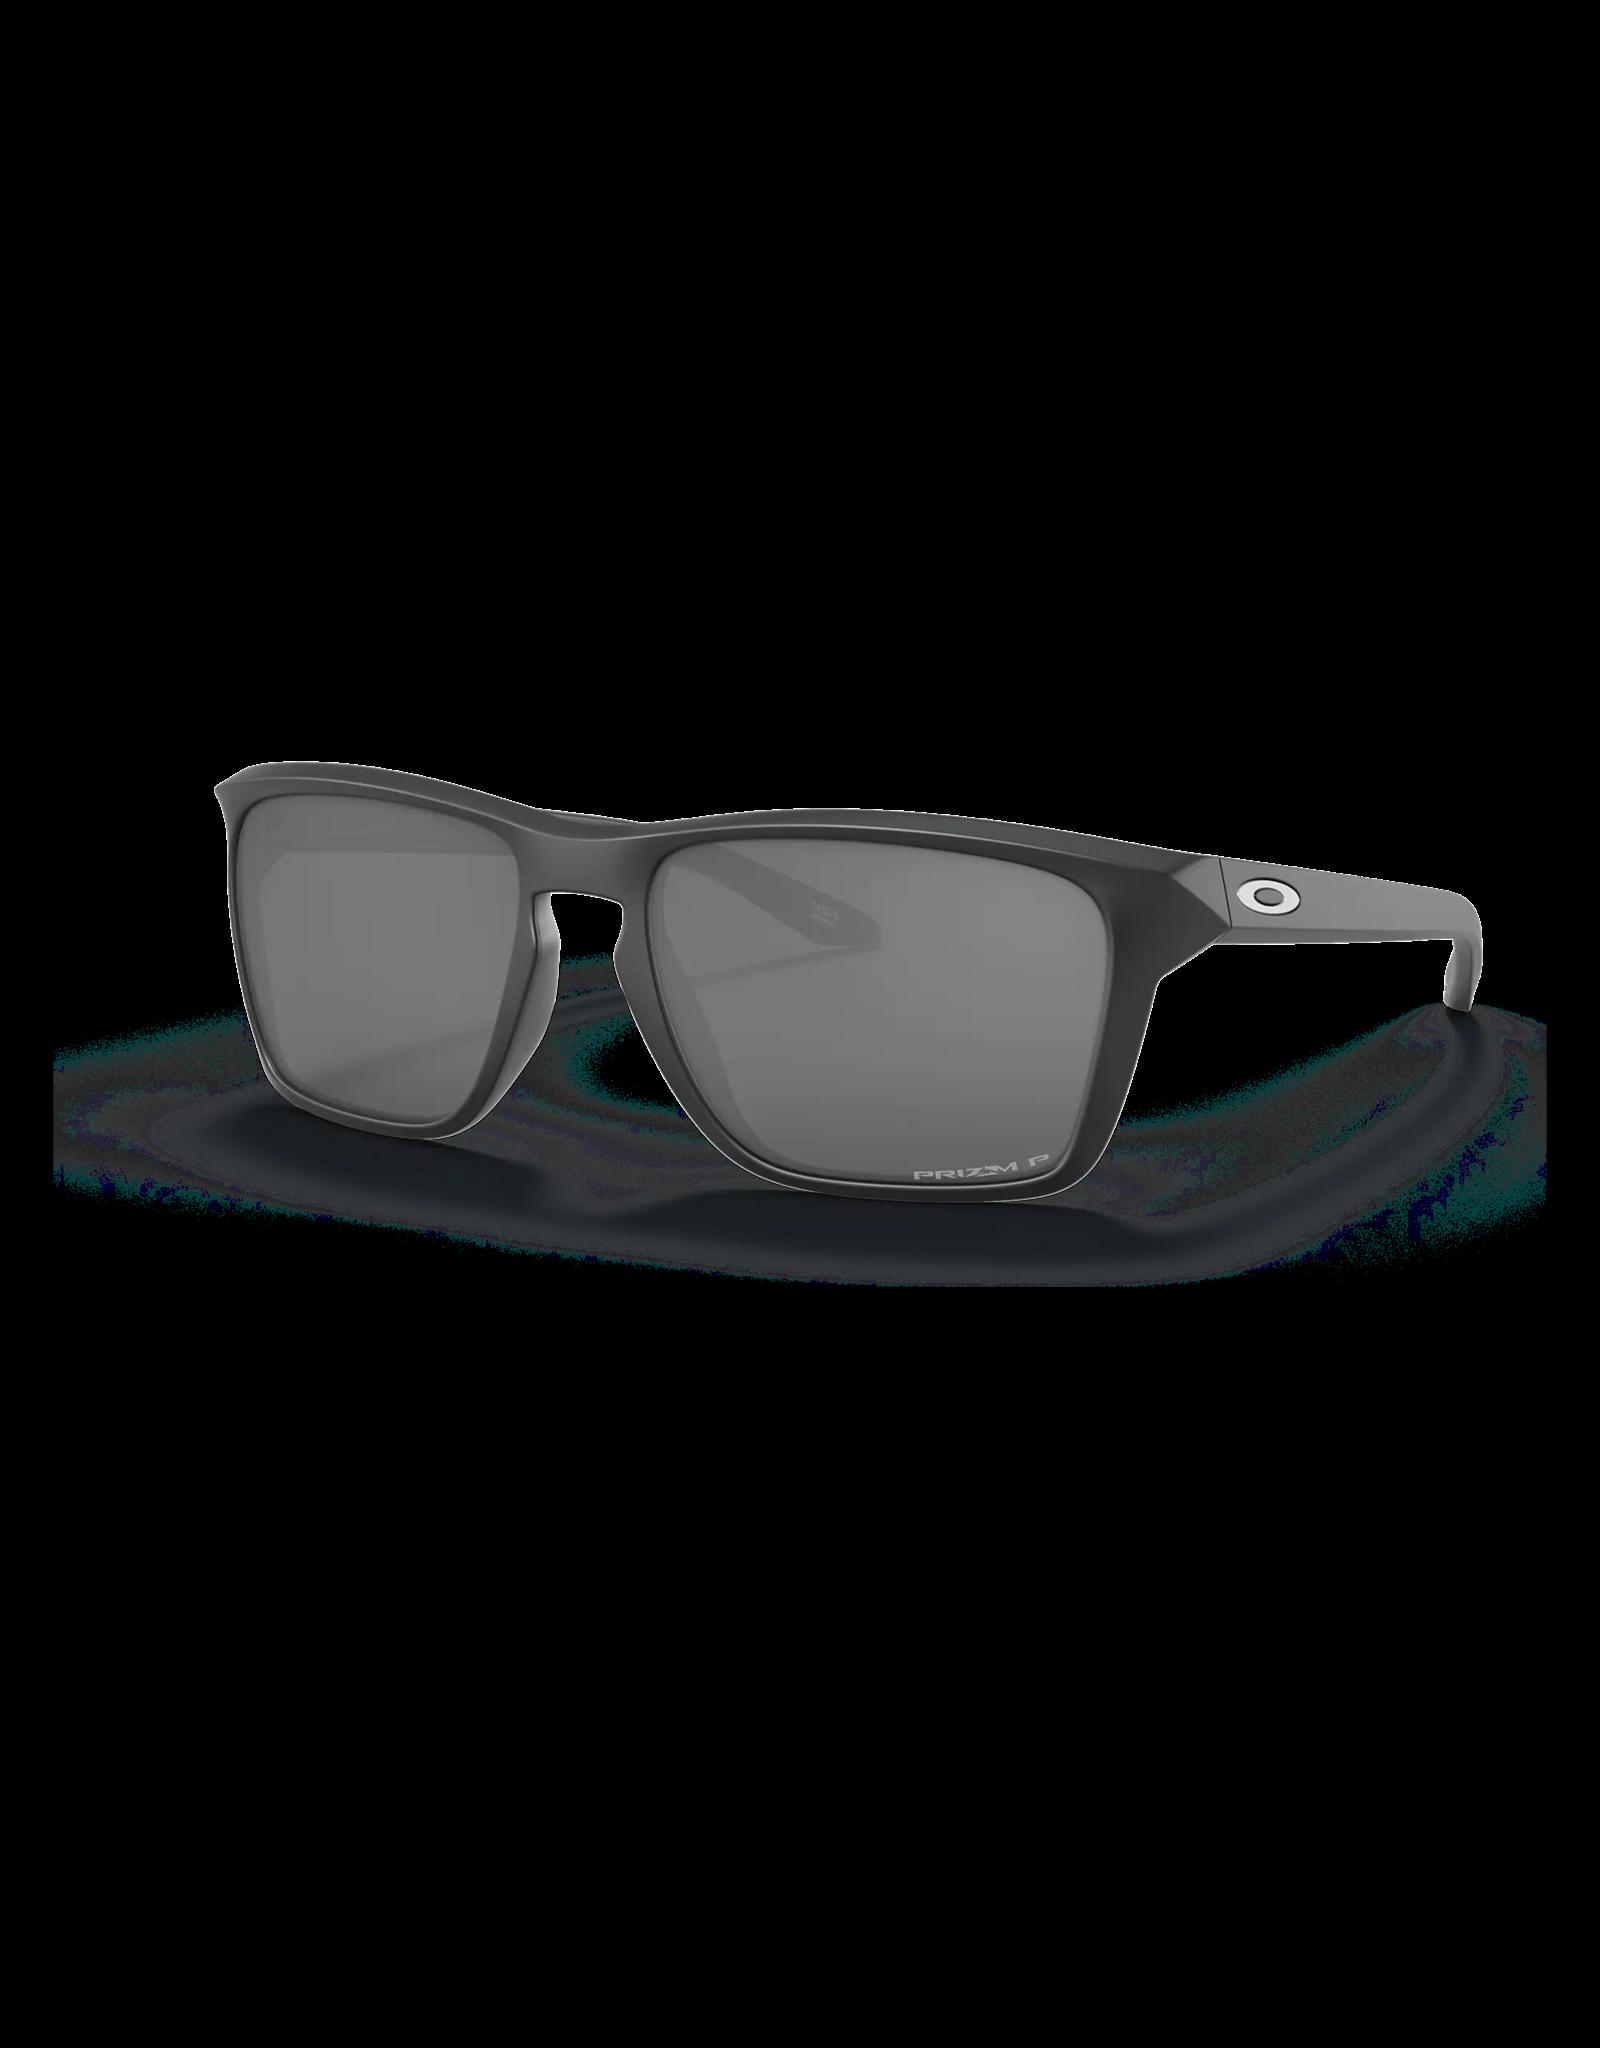 OAKLEY Oakley Sylas matte noir prizm polar black sunglasses